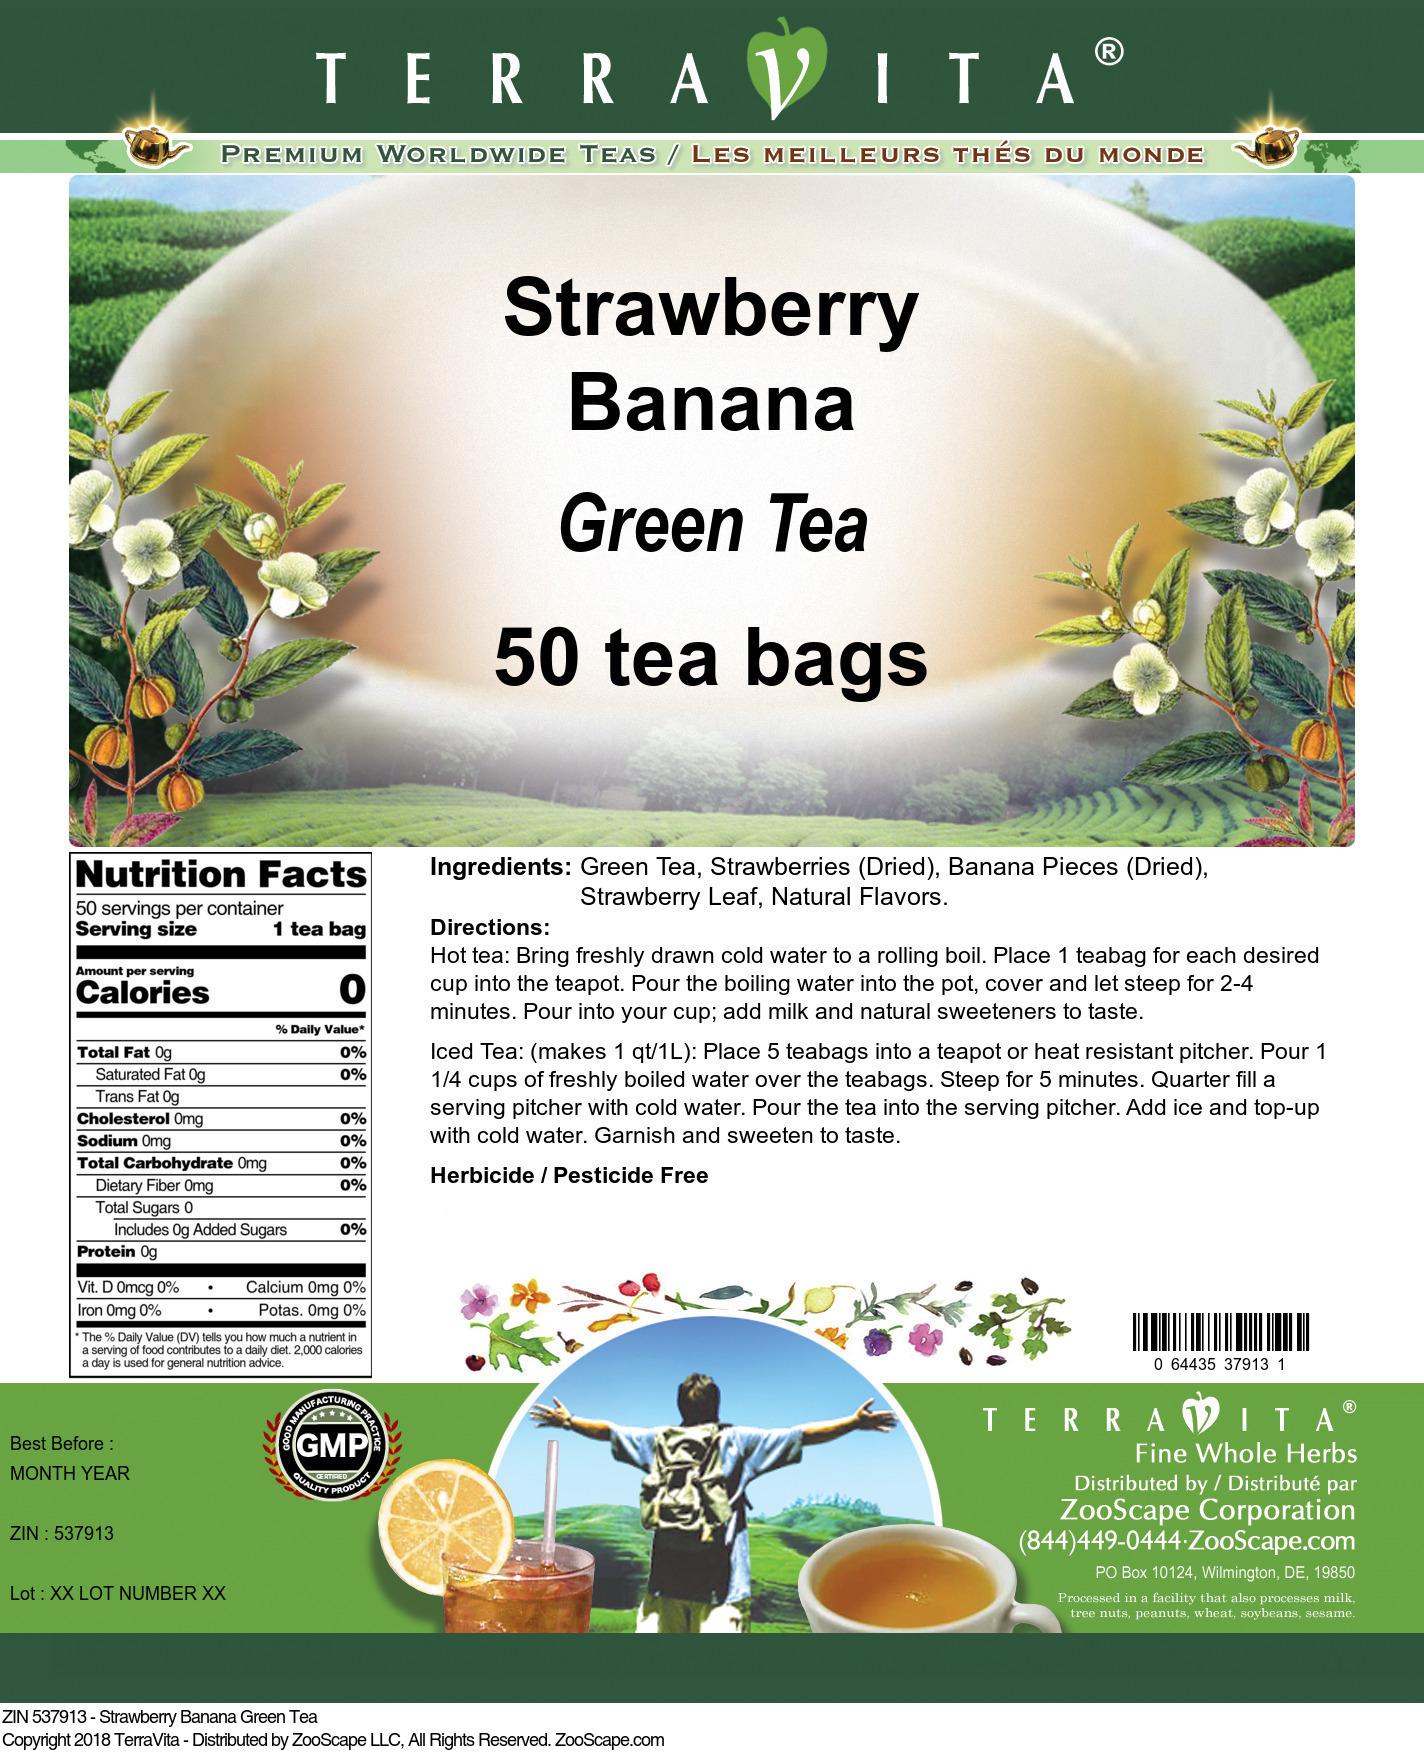 Strawberry Banana Green Tea